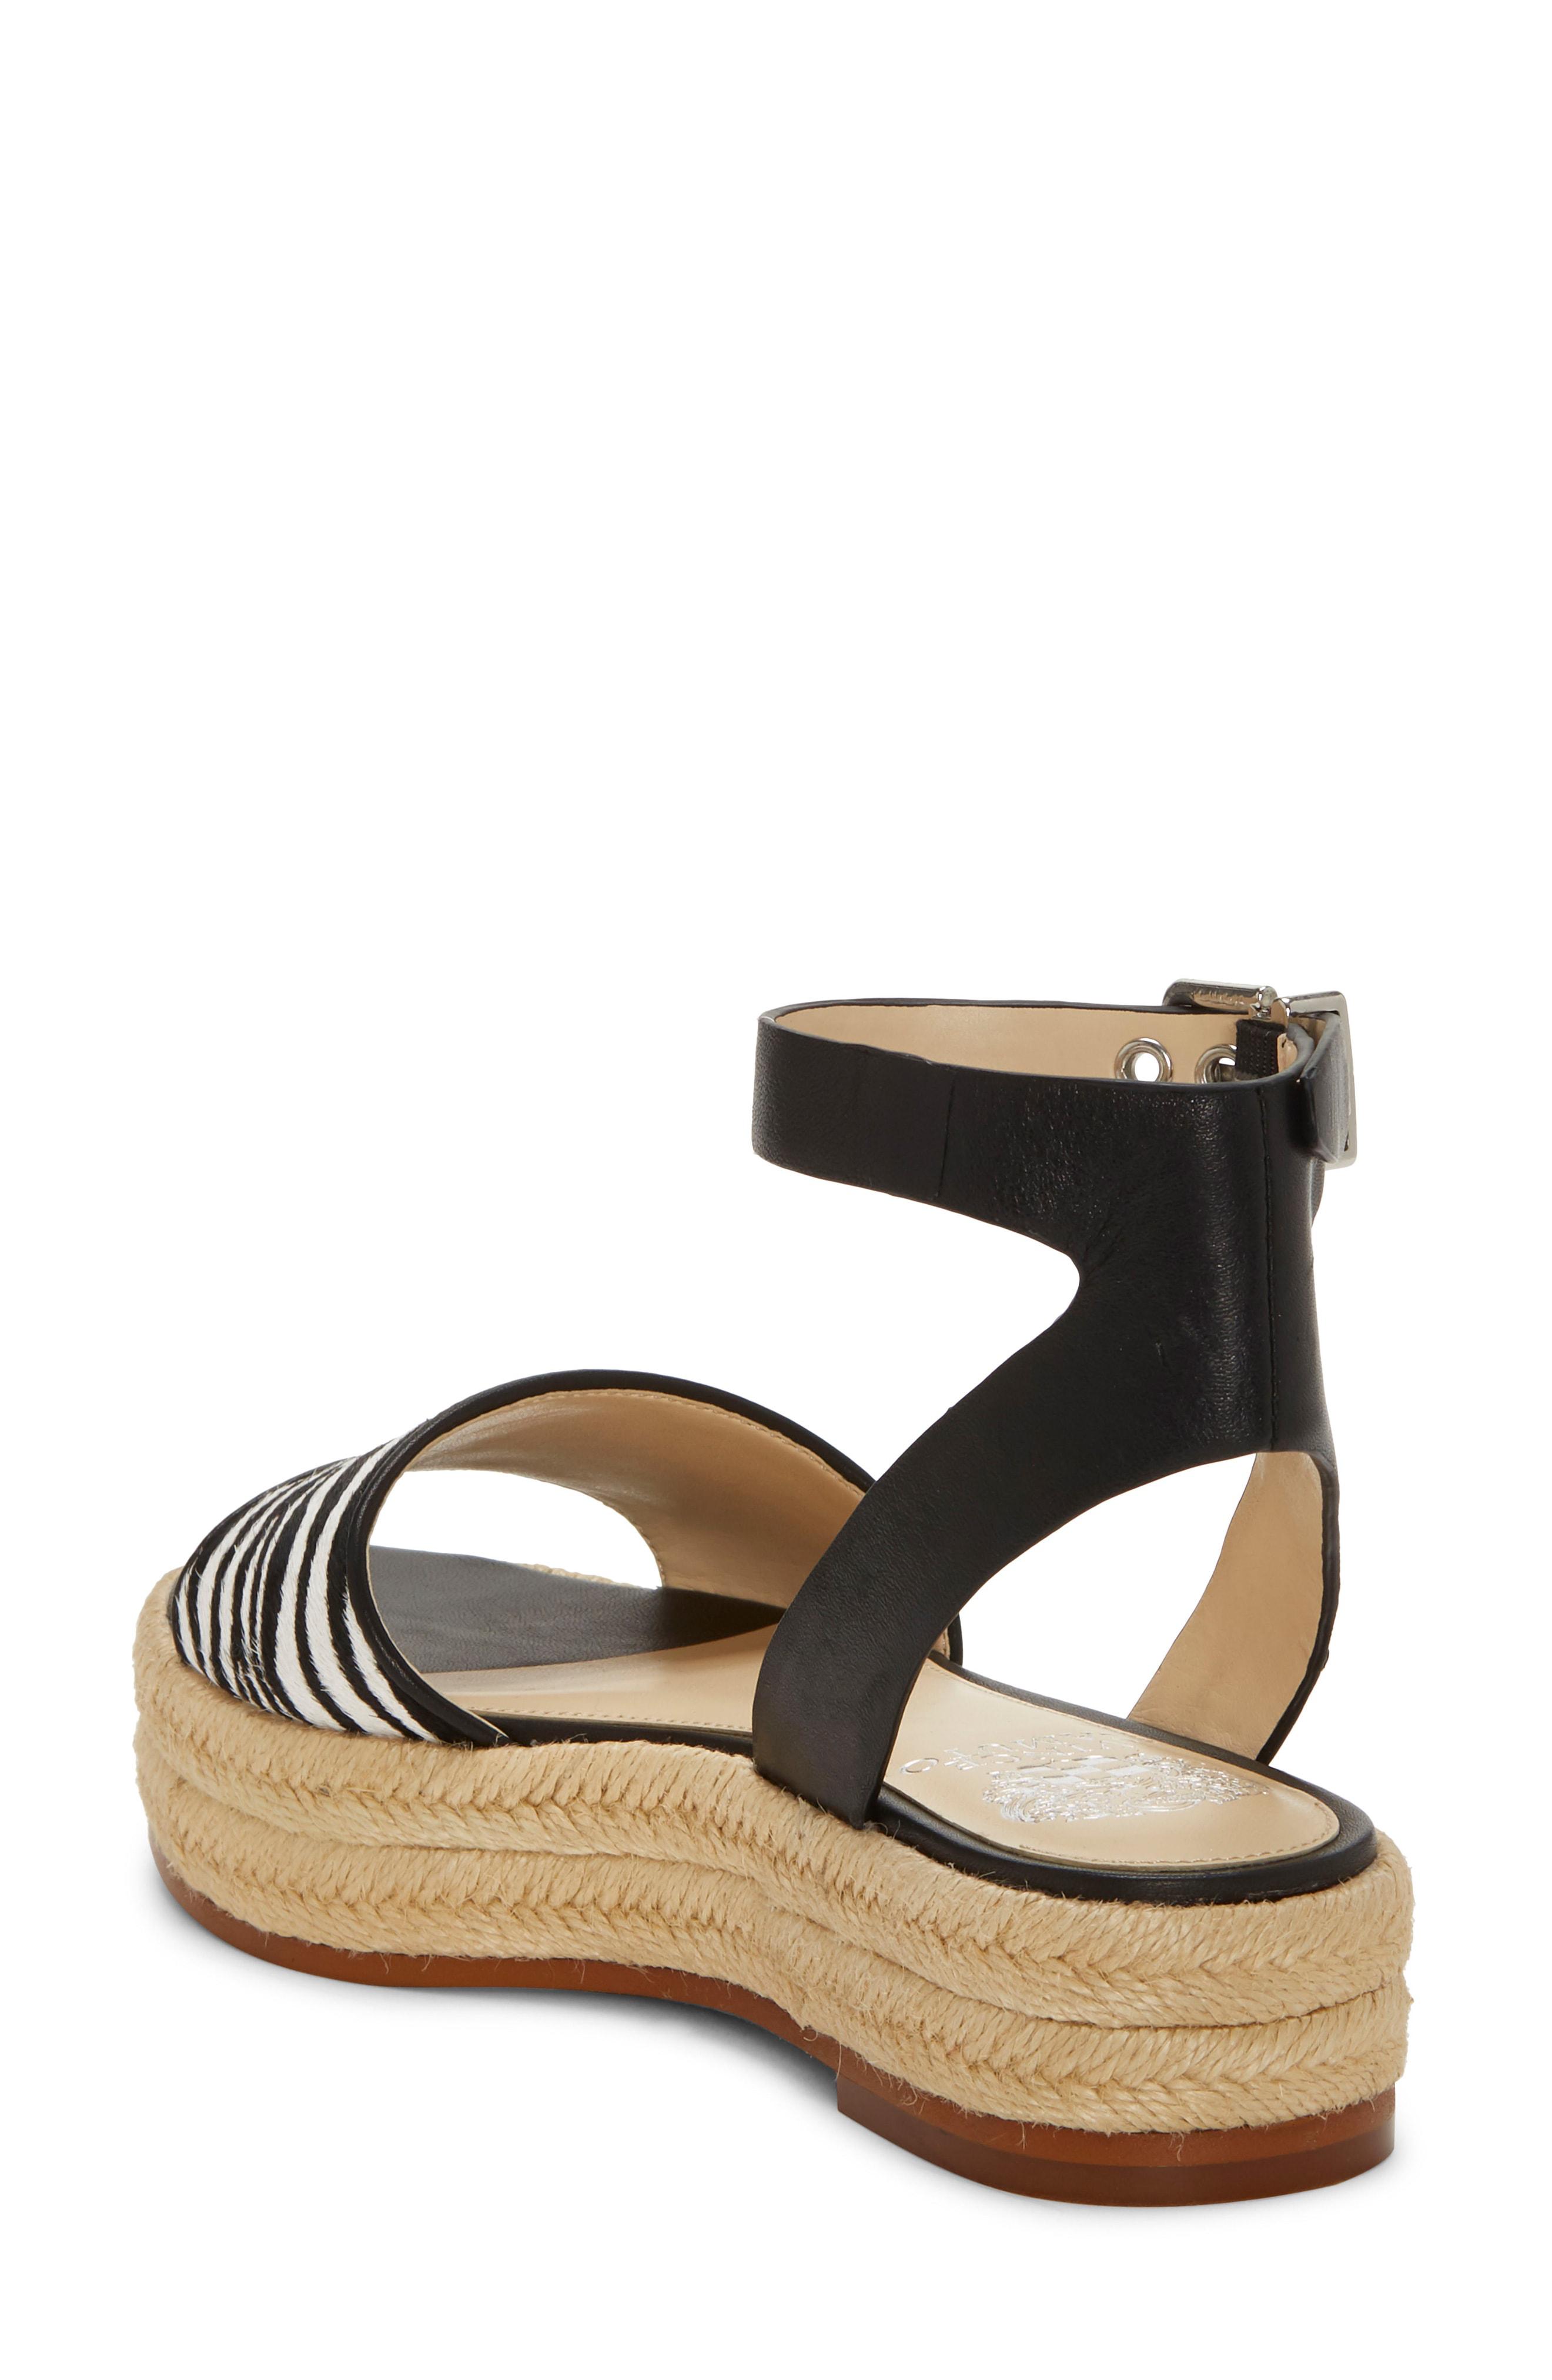 5b18b85a808 Vince Camuto Kathalia Platform Sandal In Gold Fabric